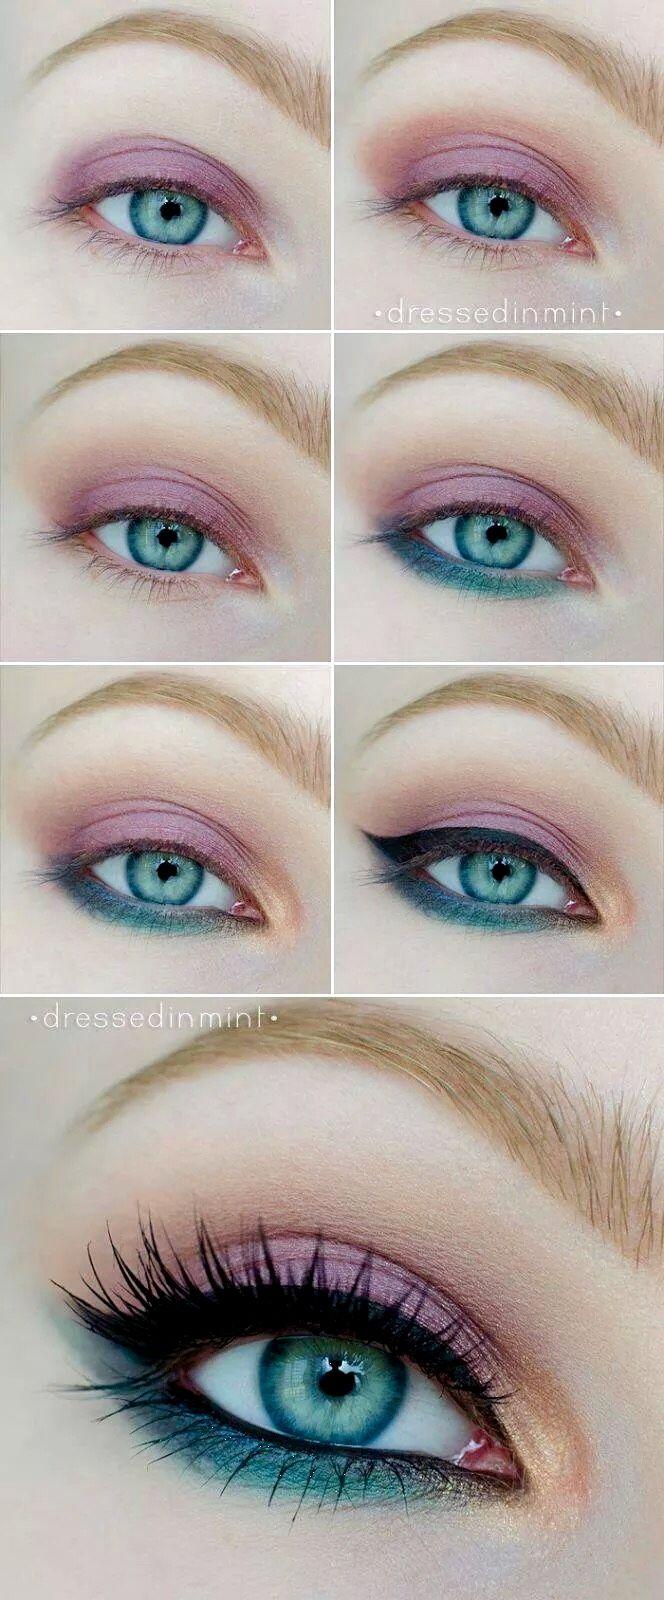 Tuto Maquillage Yeux Bleus Fabulous Tuto Maquillage Mariee